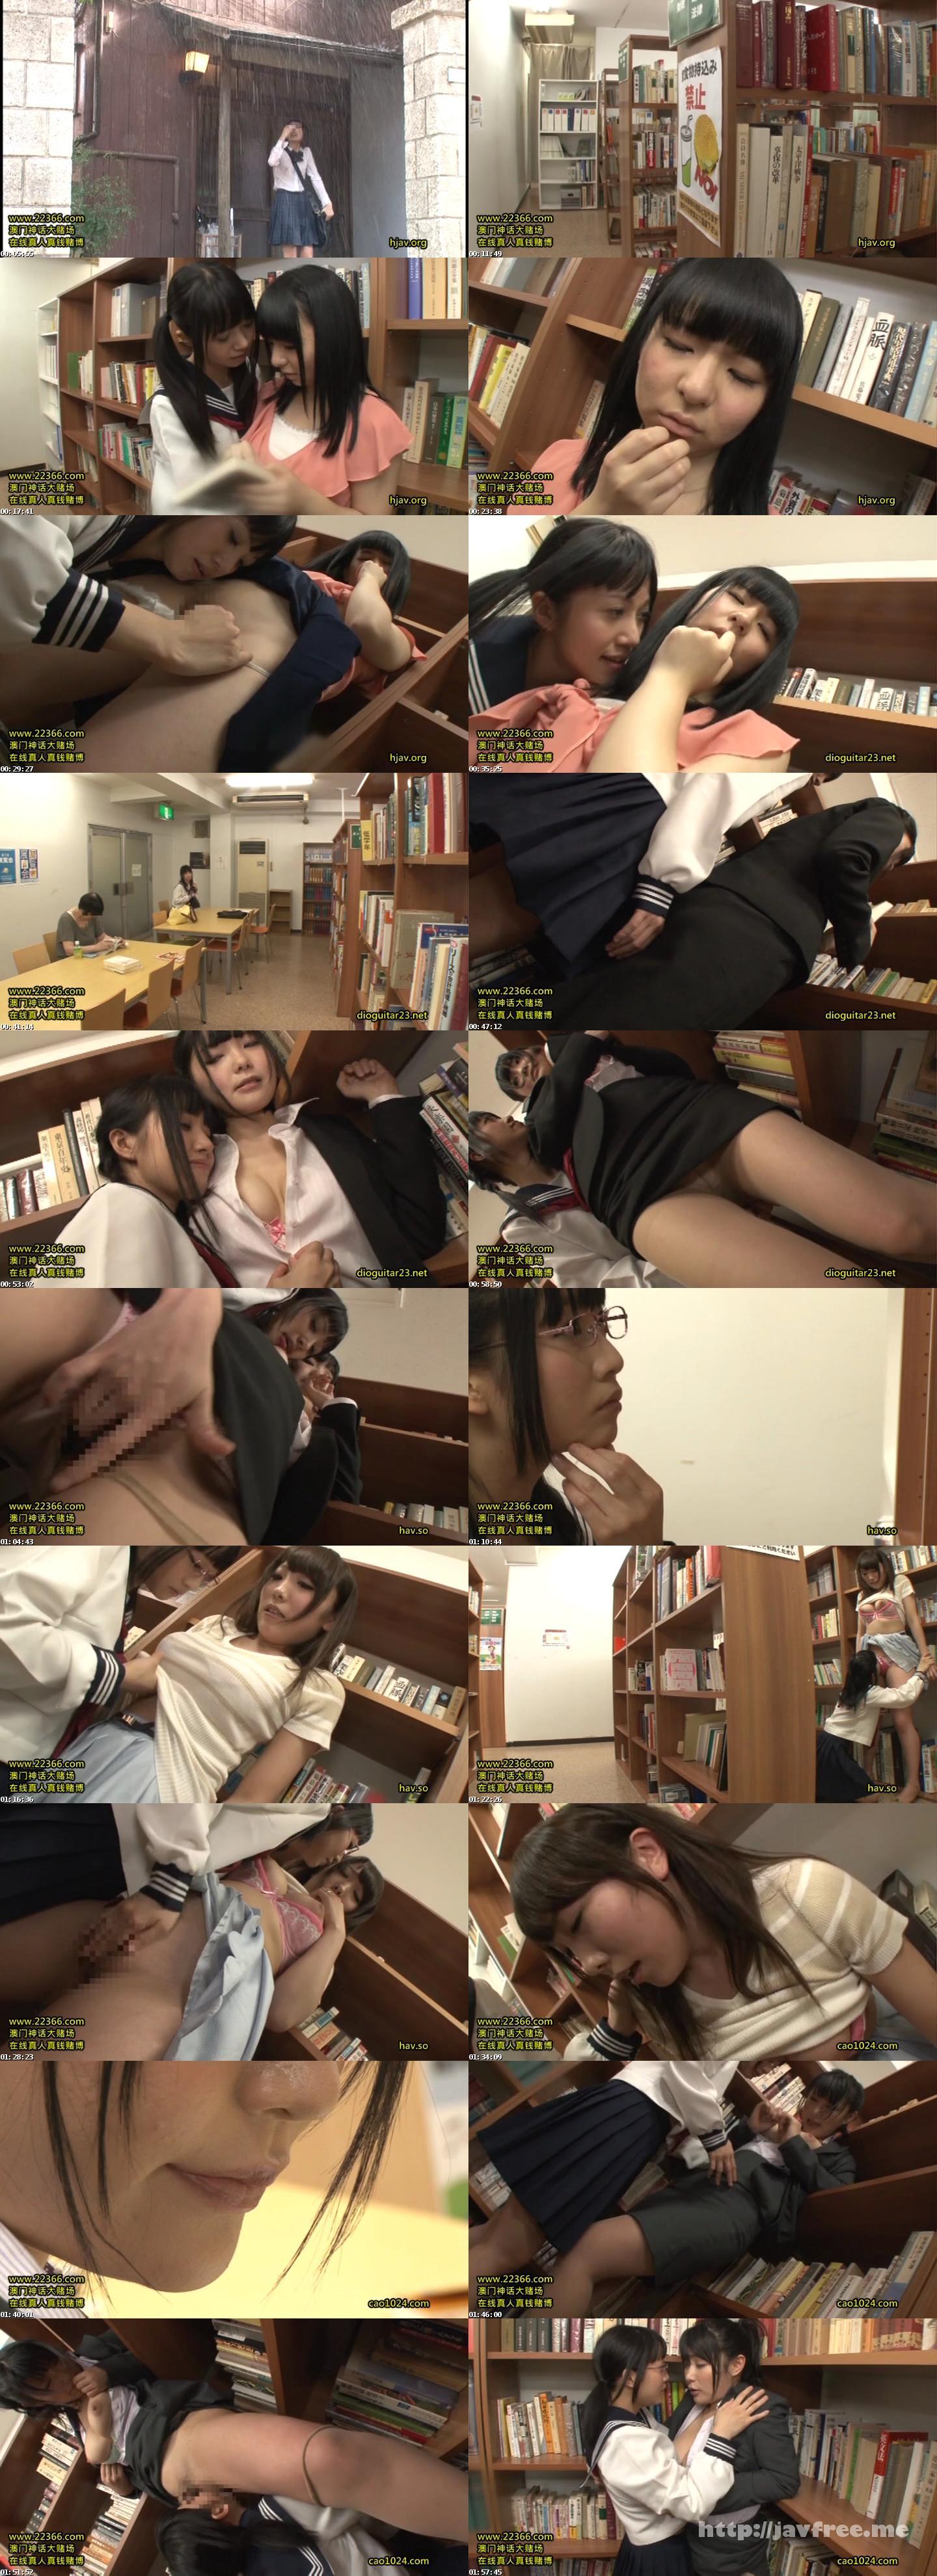 [AP 158] 女子校生図書館レズ痴漢 真面目そうな見た目と裏腹に、異常に性欲が強い美少女女子校生は図書館で見かけたウブそうな美人お姉さんをレズ痴漢してしまう! AP